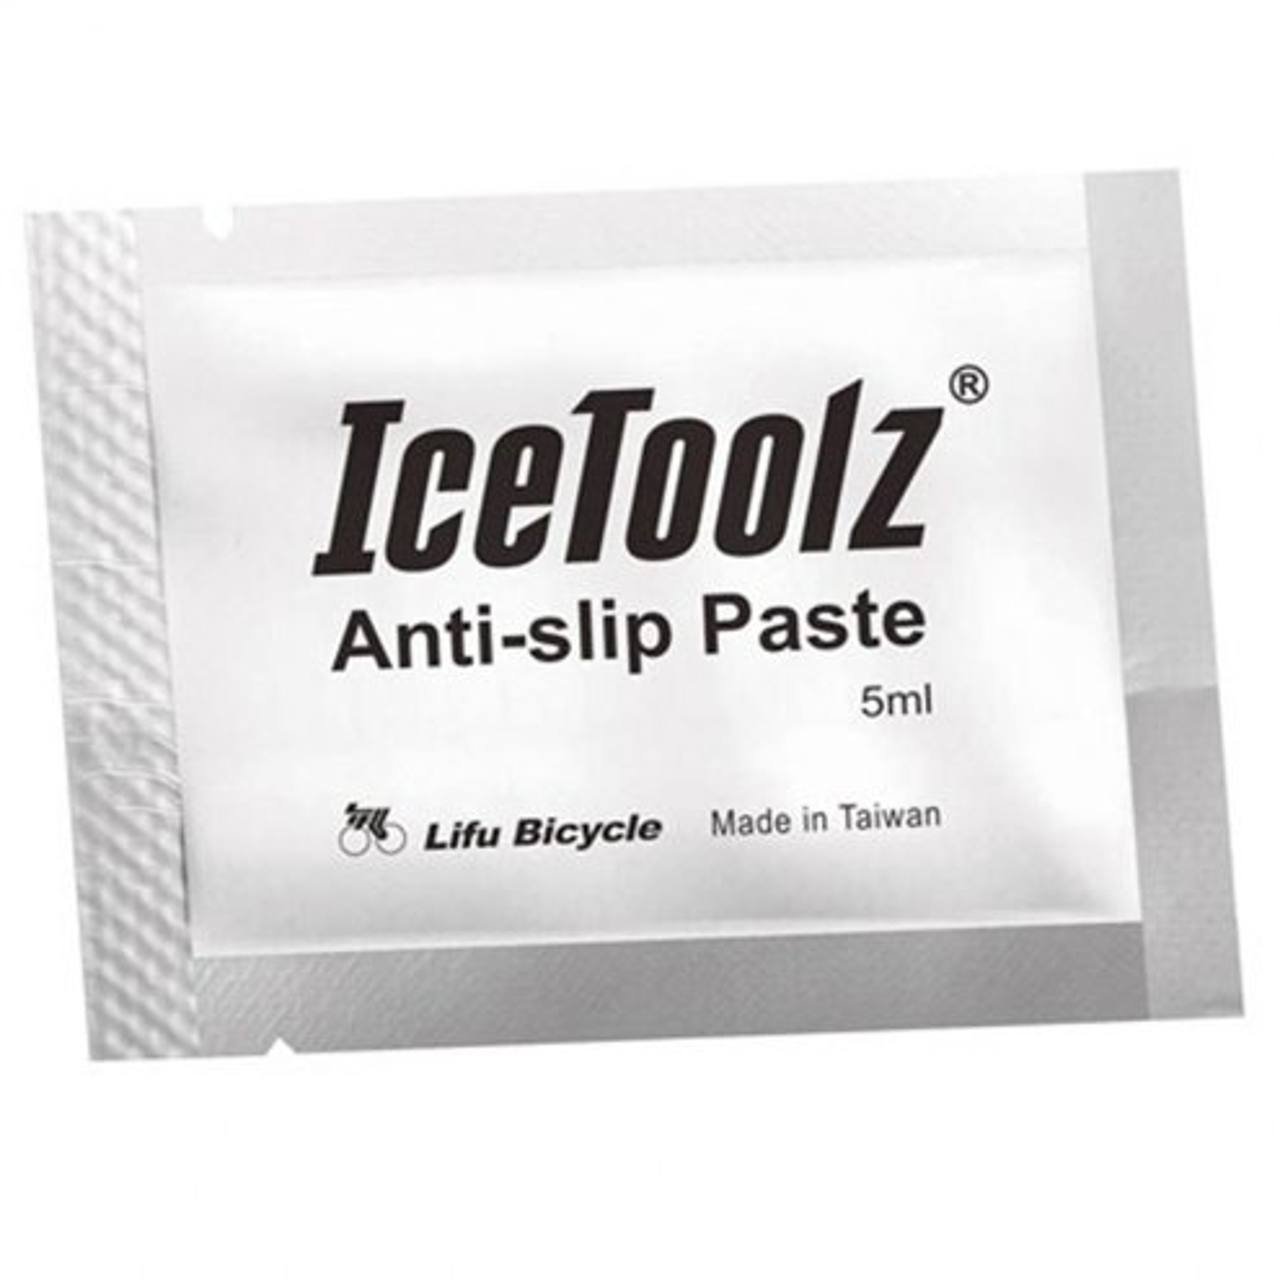 PASTA ANTI-DESLIZANTE ICETOOLZ C145 P/ MONT. CARBONO (5ml)